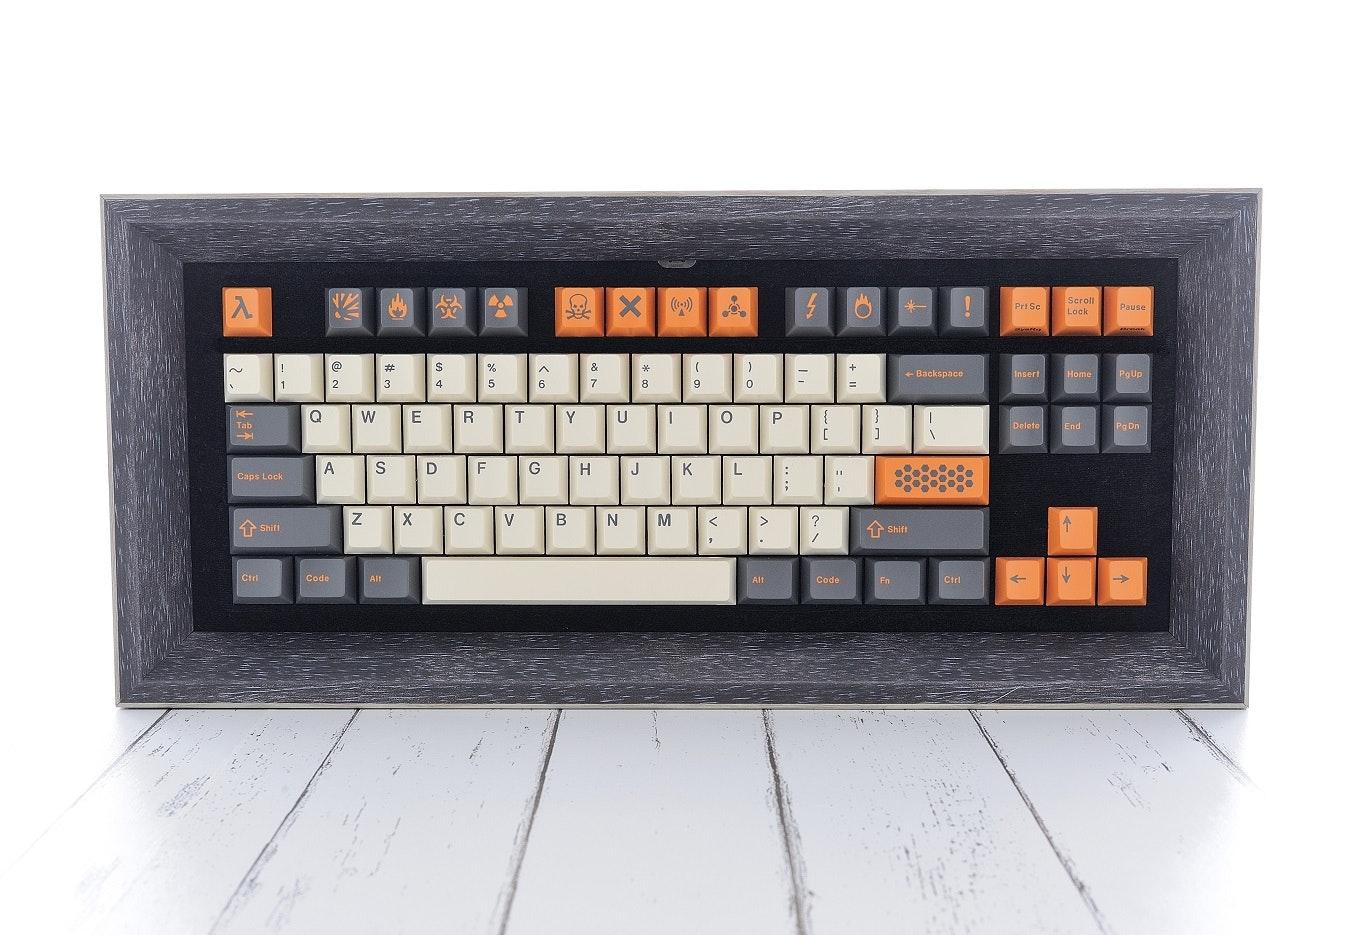 Keycaps Frame for Collector - deskthority